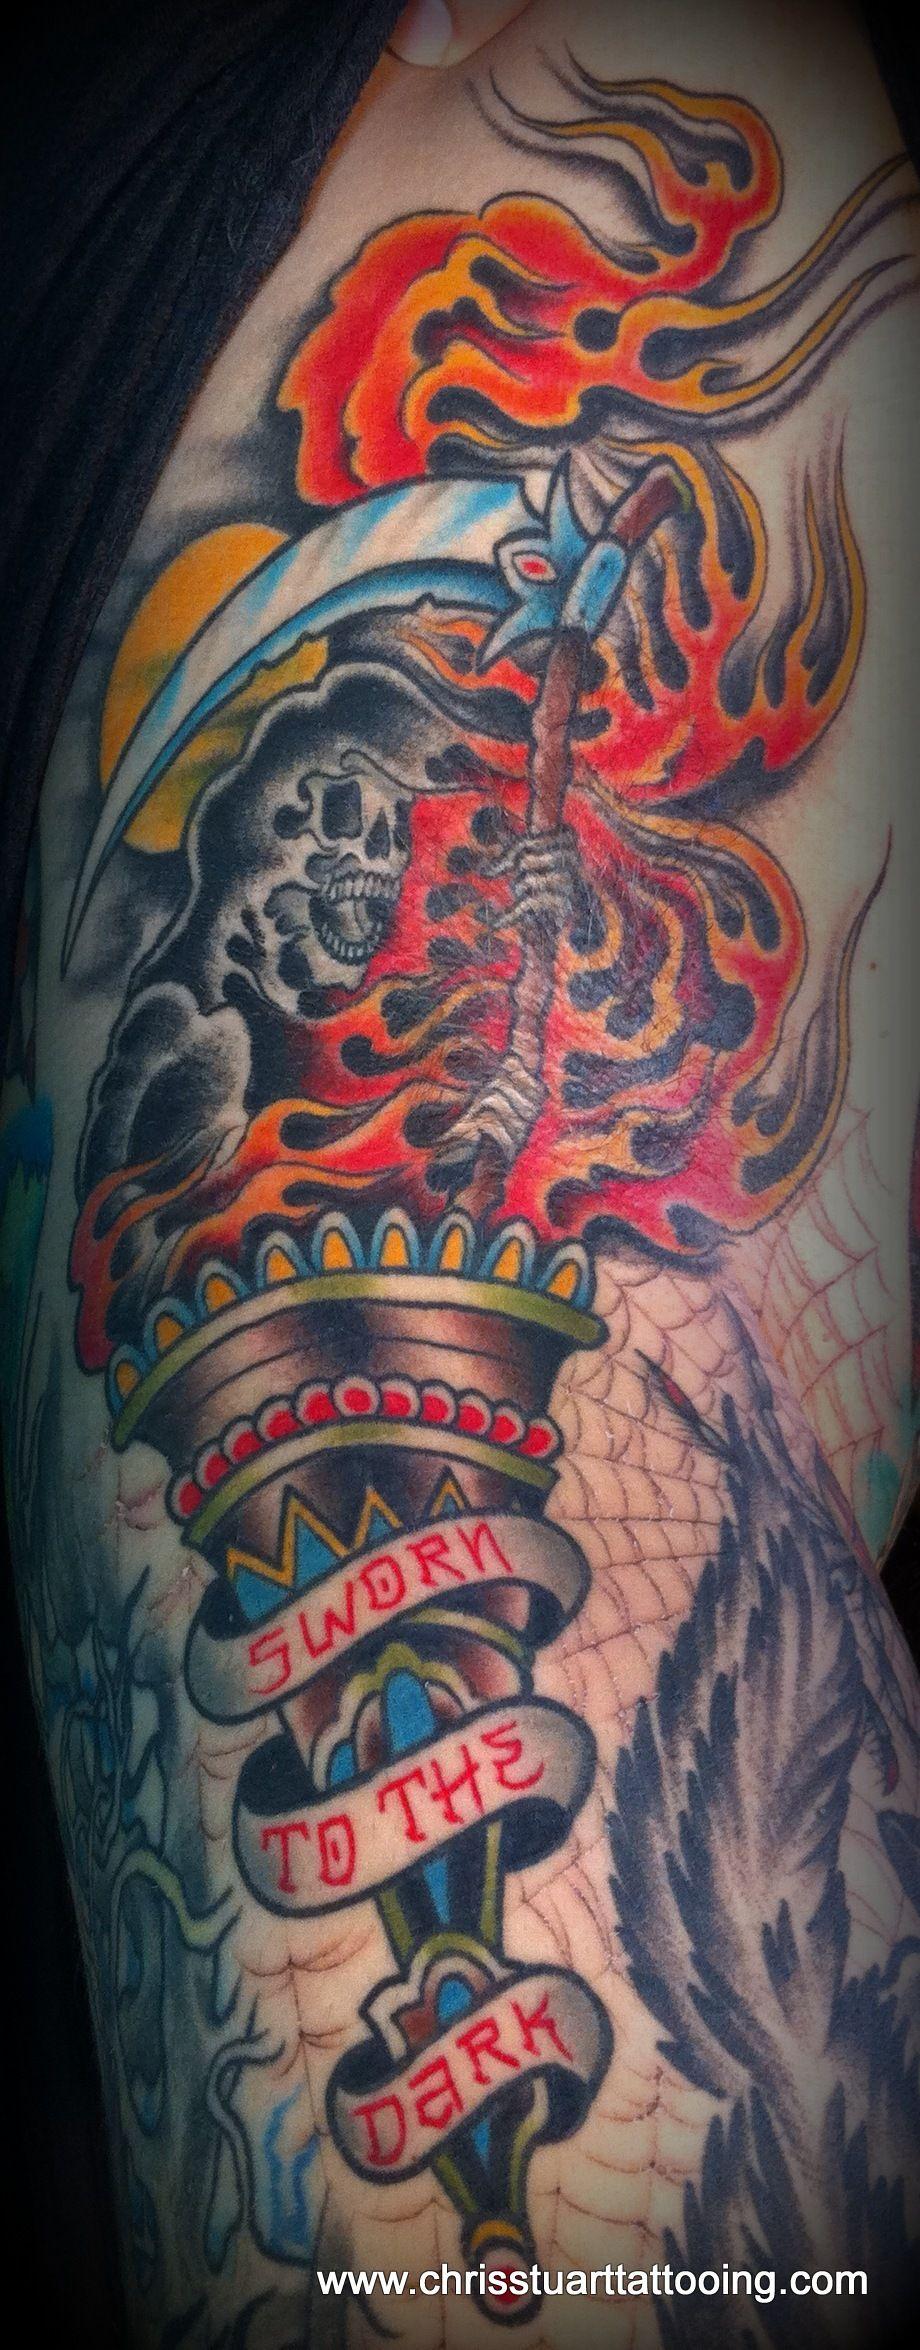 Pin On Tattoos By Chris Stuart